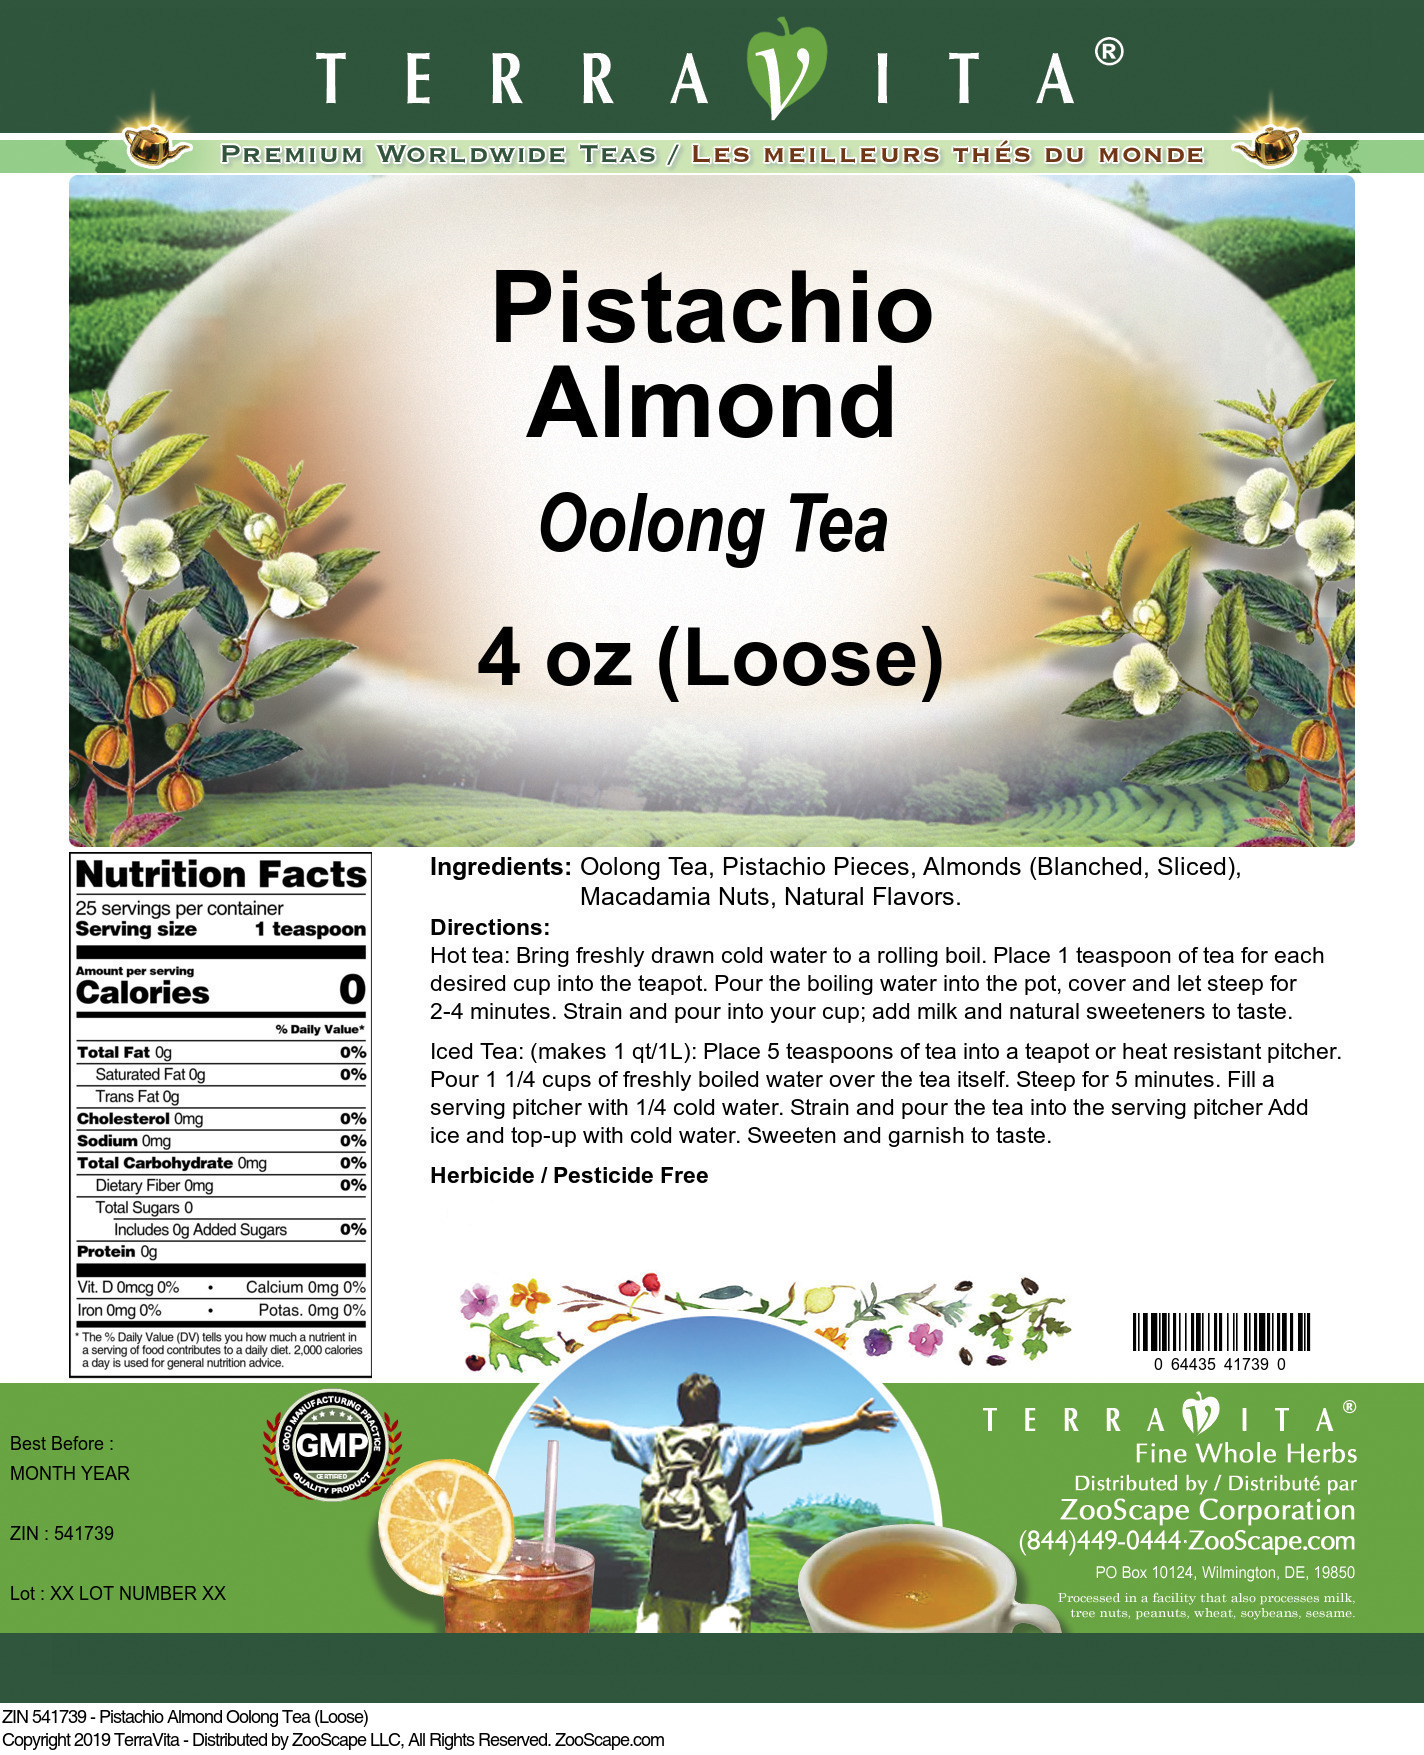 Pistachio Almond Oolong Tea